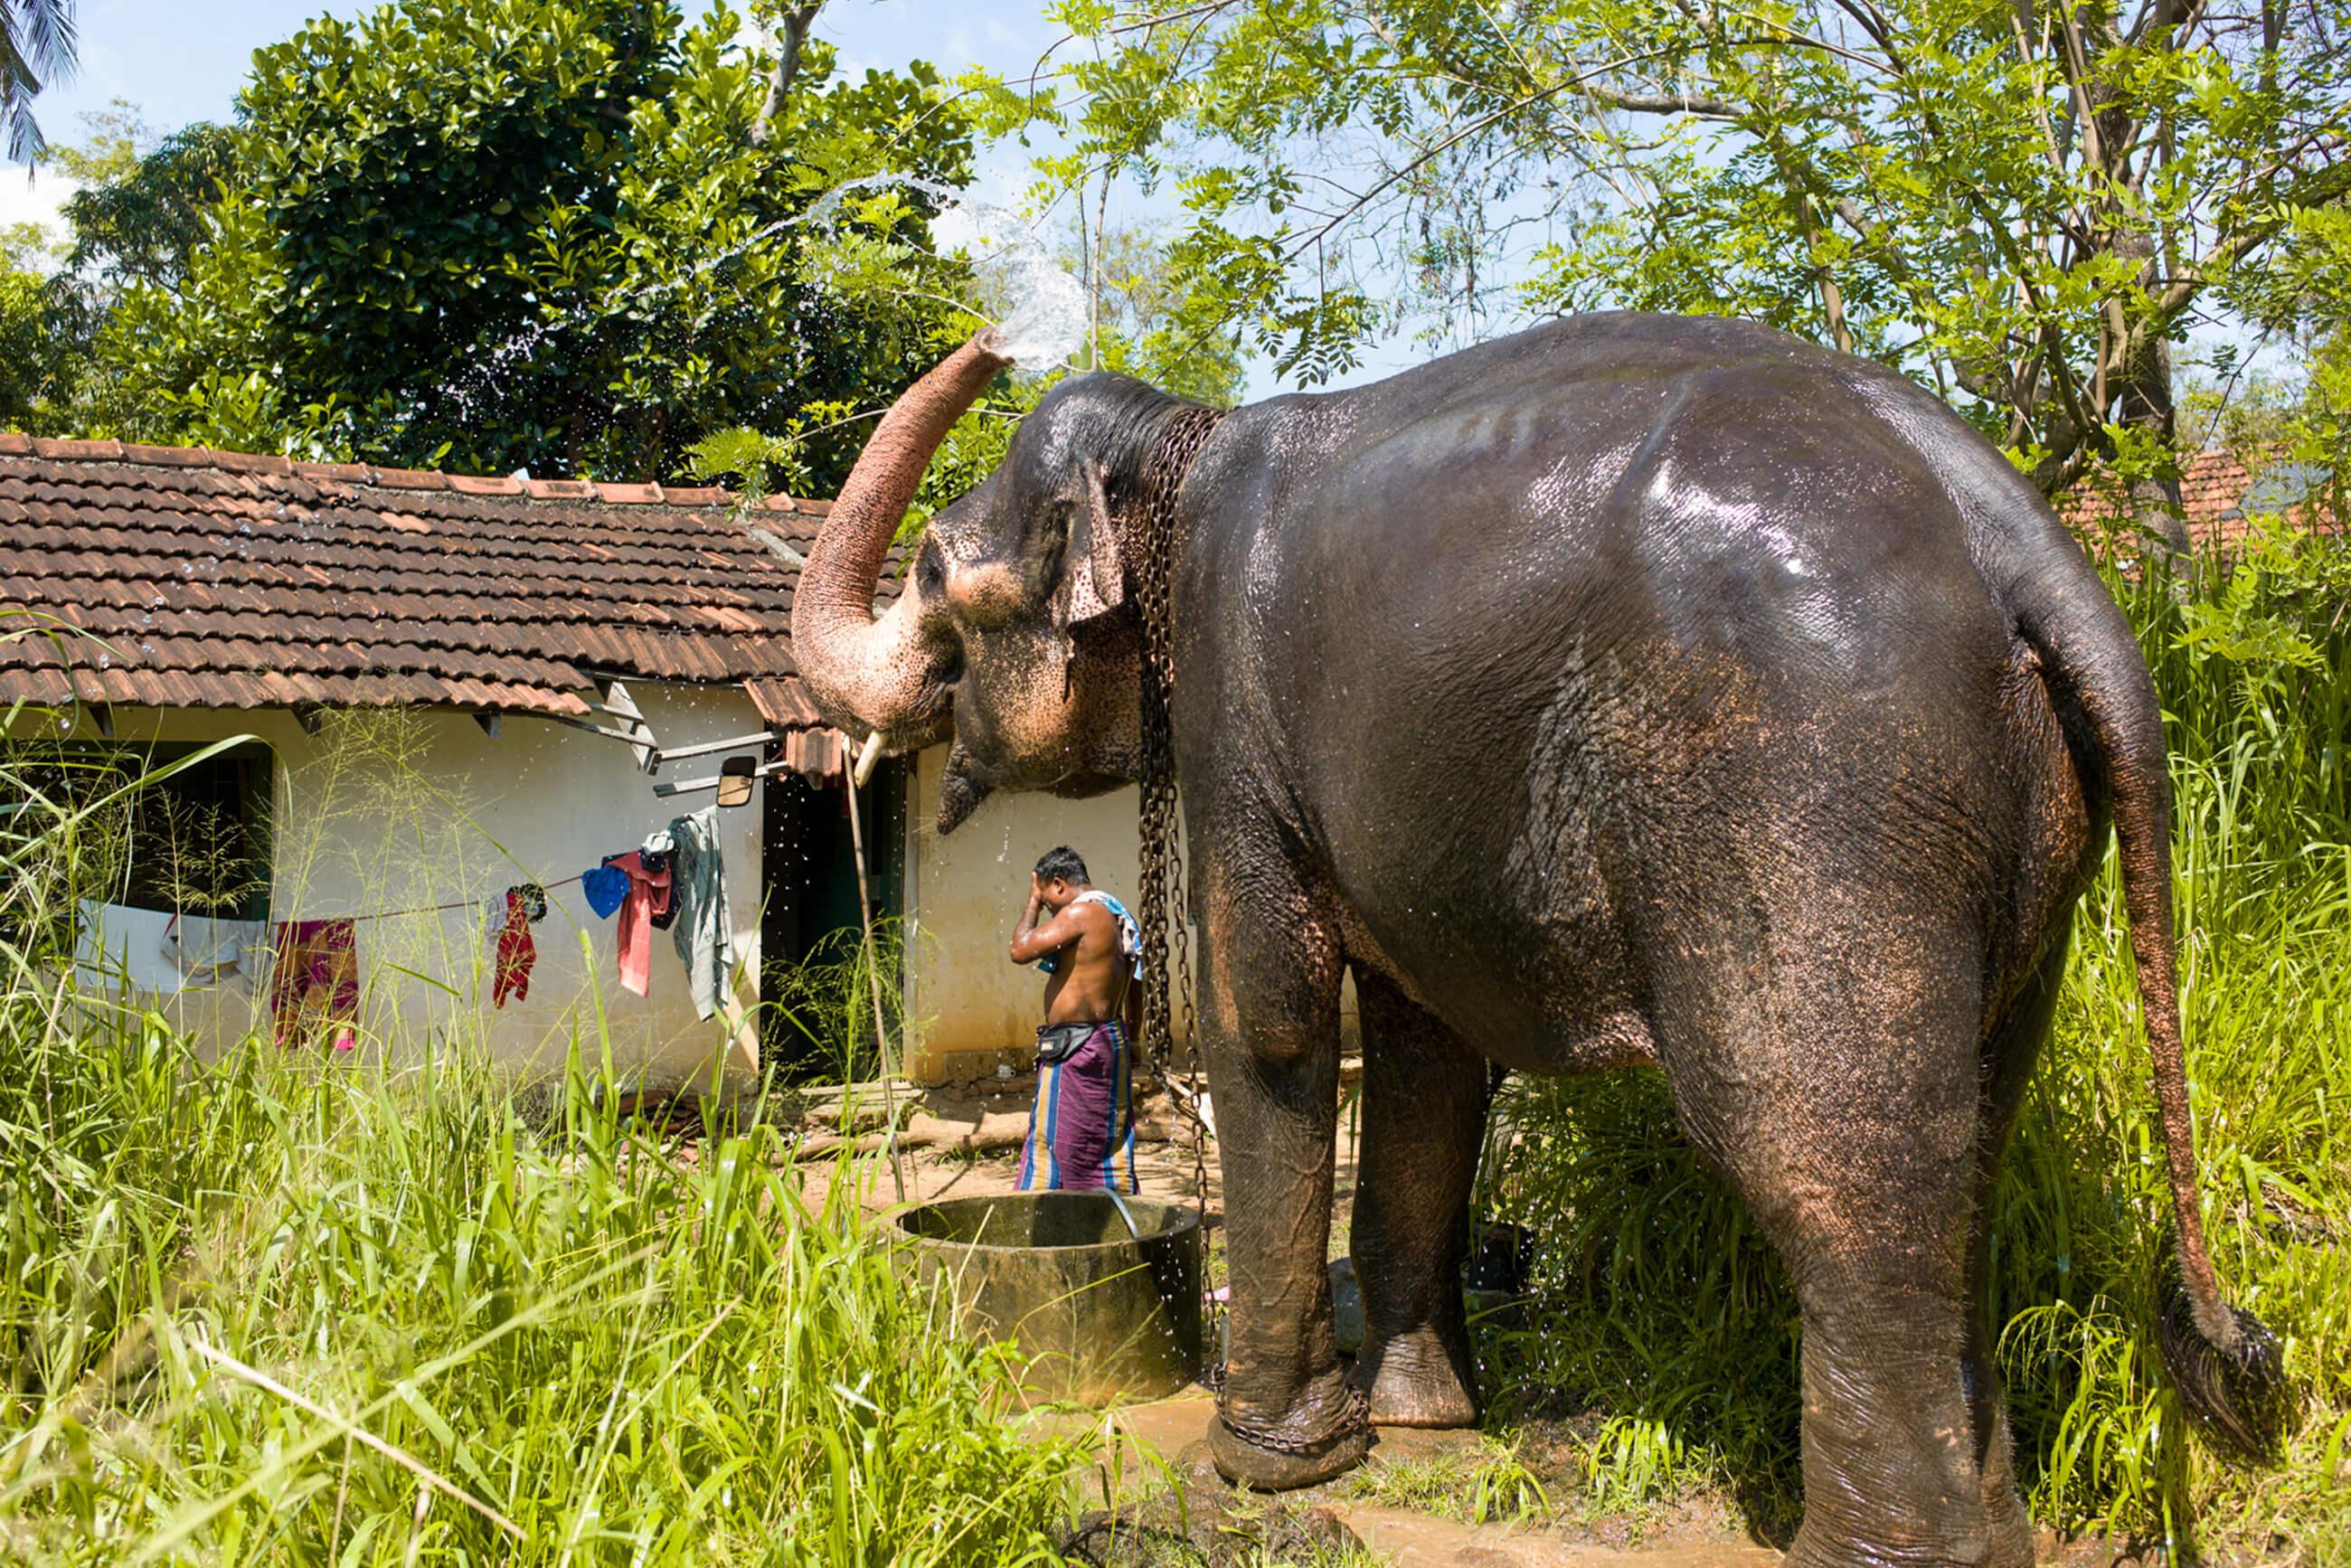 https://bubo.sk/uploads/galleries/7521/srilanka_family_nas-slonik-sa-predtym-ako-na-neho-vysadneme-sprchuje.jpg